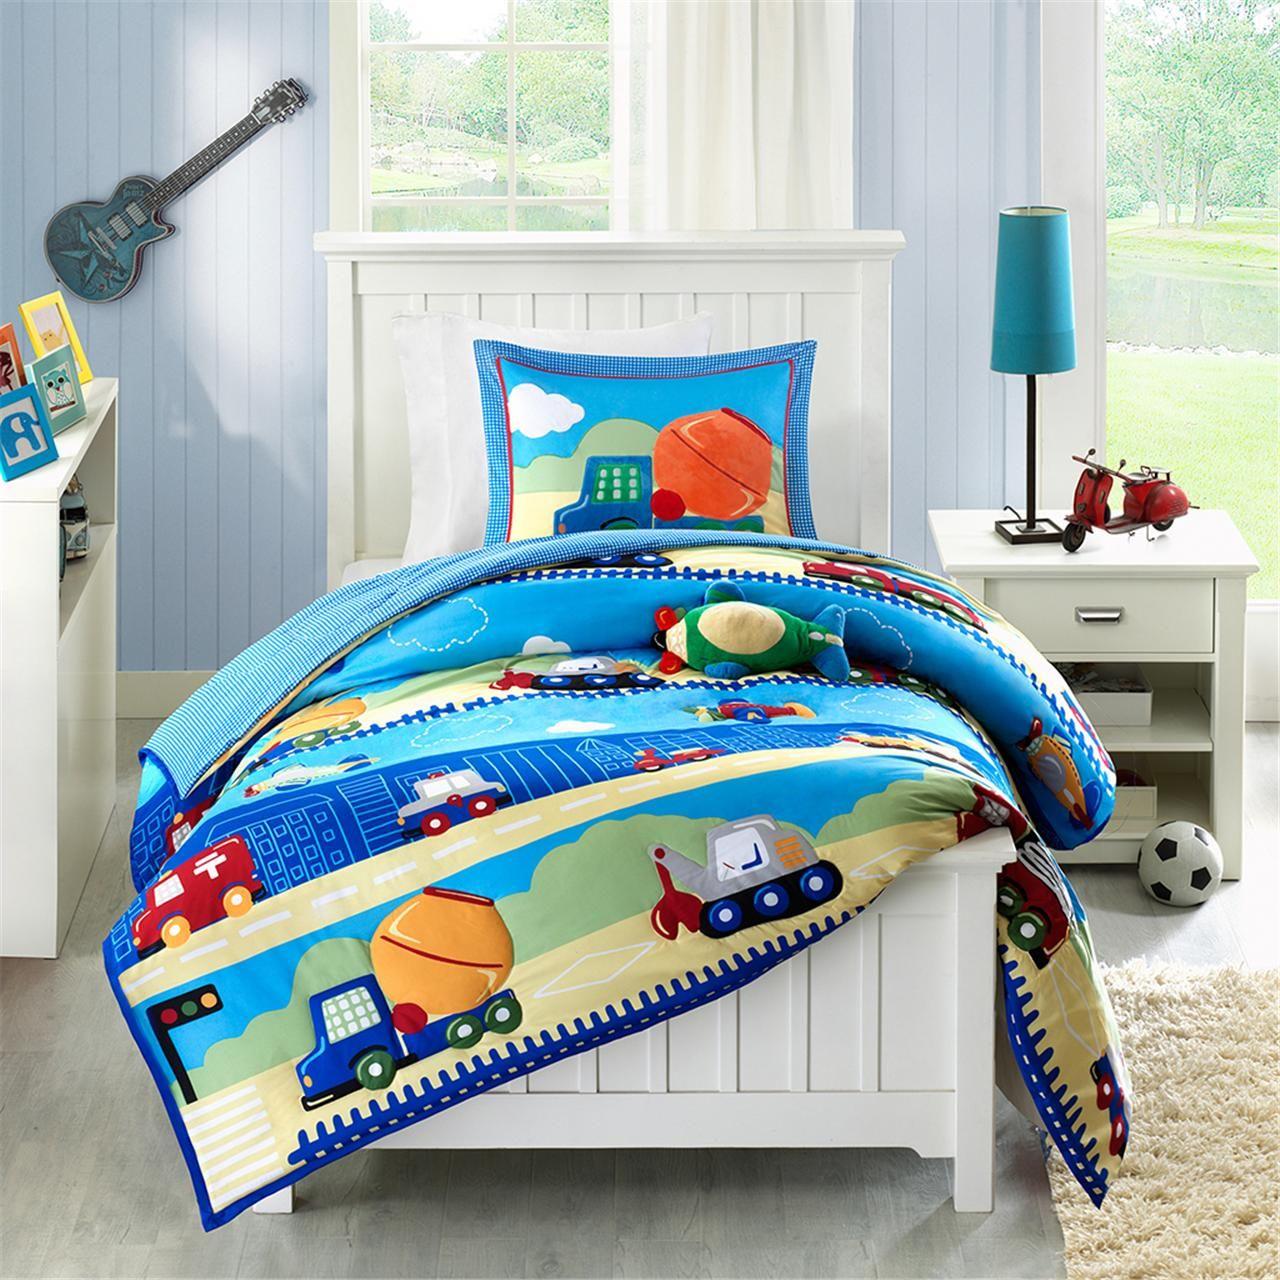 comforter full sets size boys living room boy childrens comforters i for idea